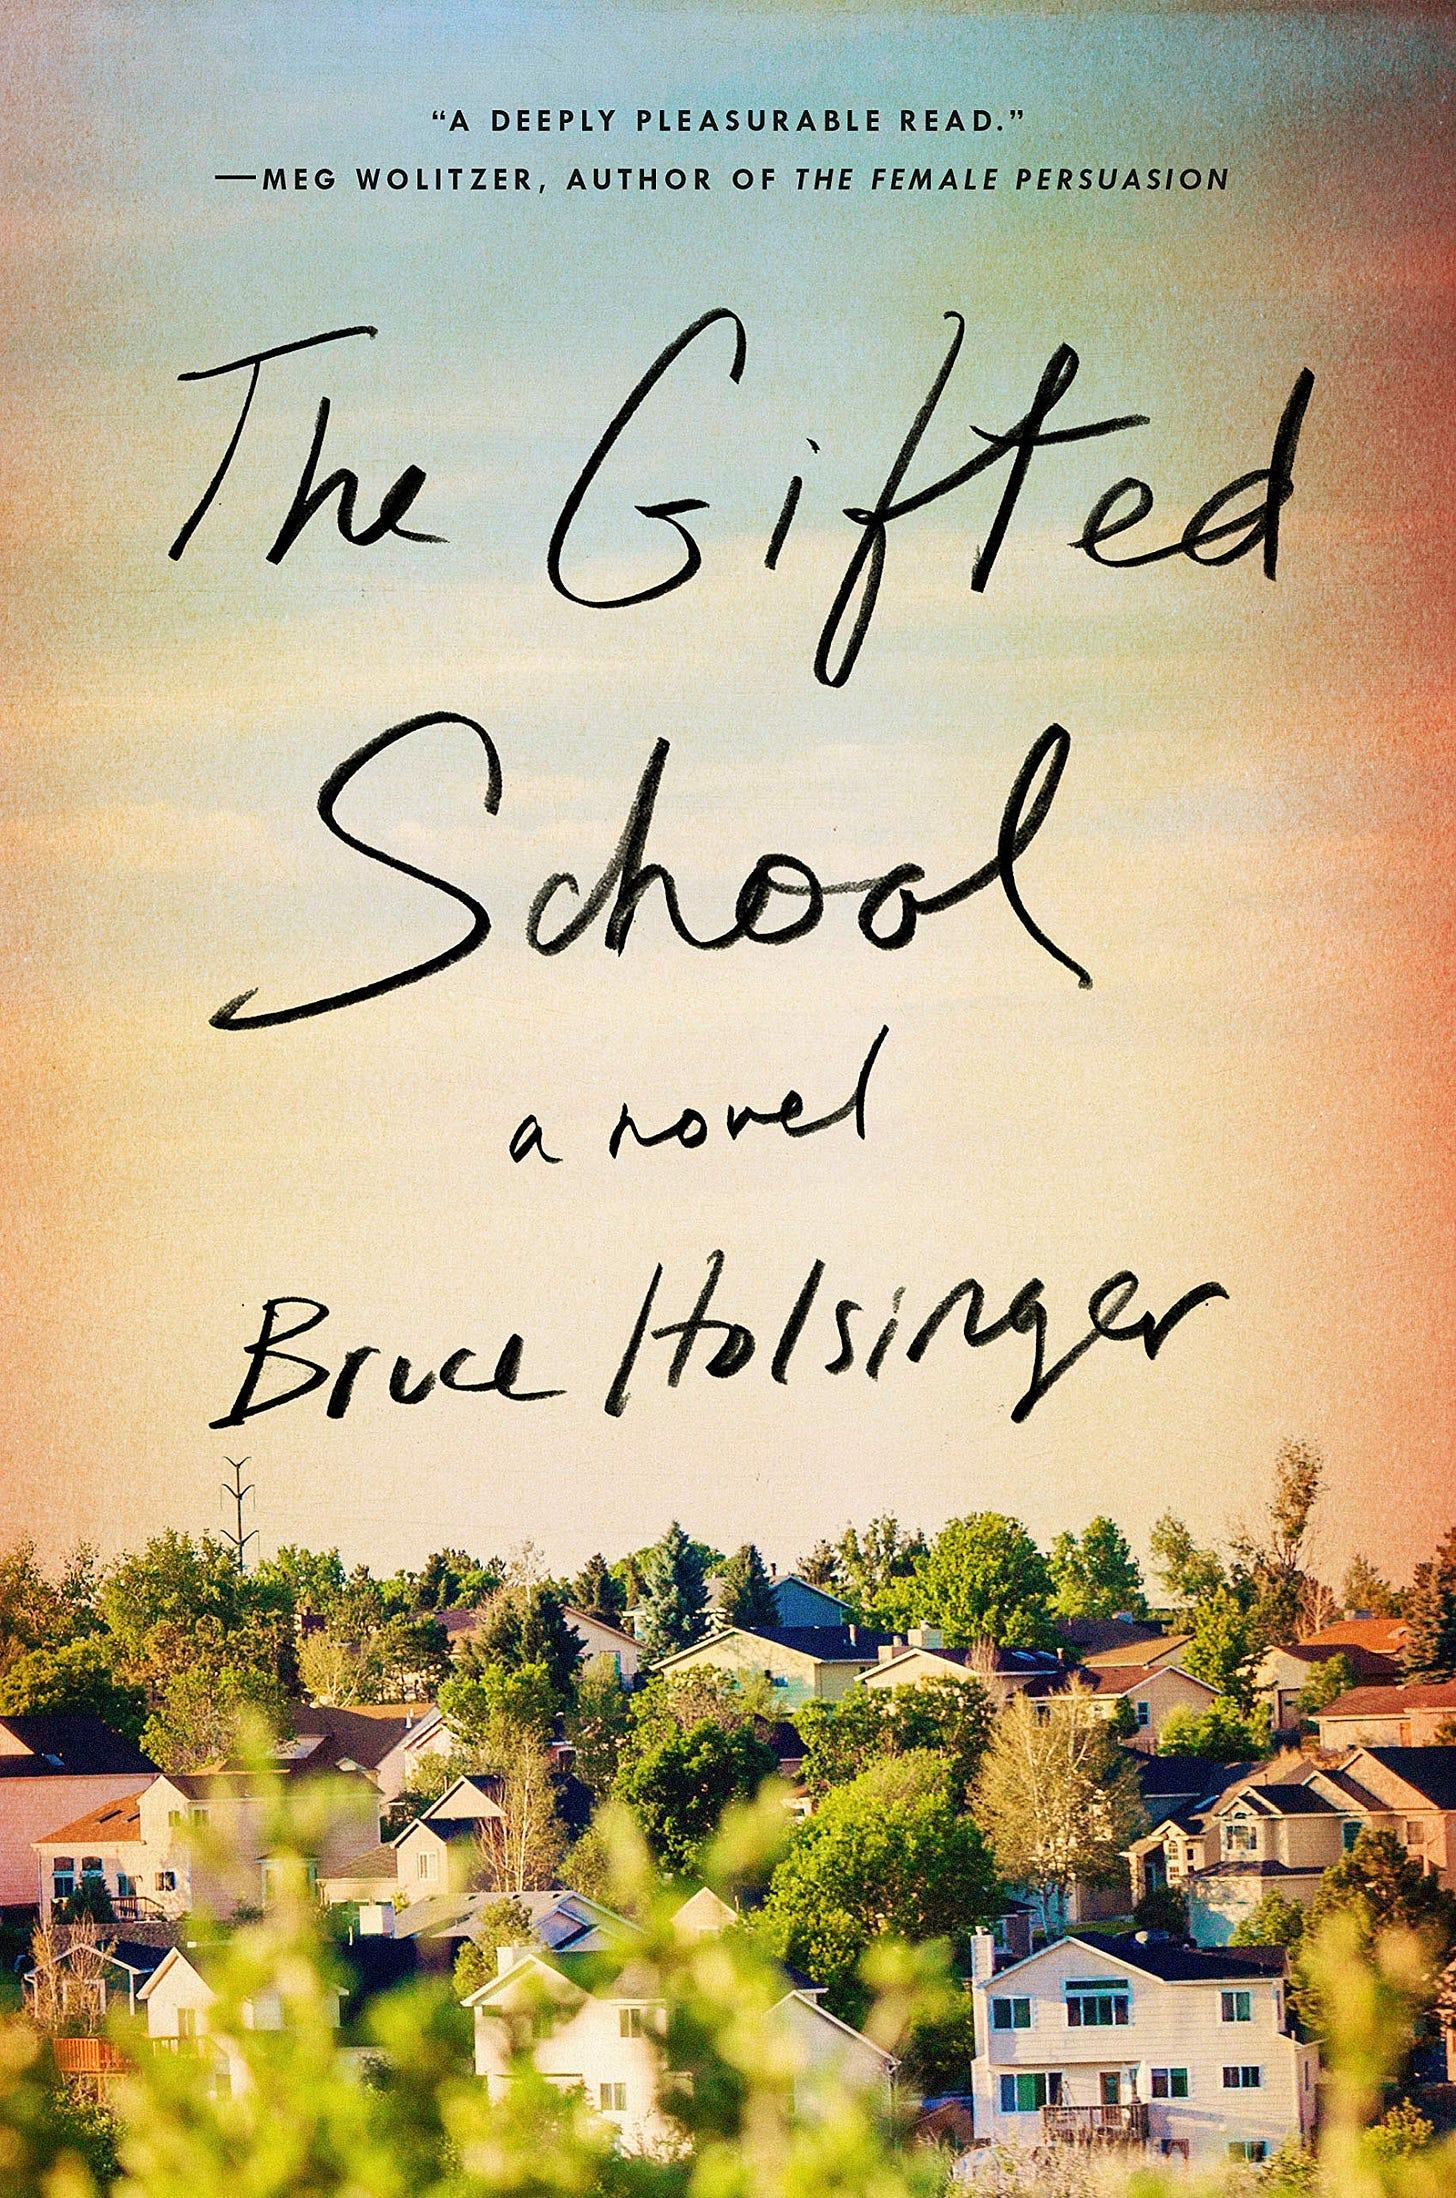 Amazon.com: The Gifted School: A Novel: 9780525534969: Holsinger, Bruce:  Books